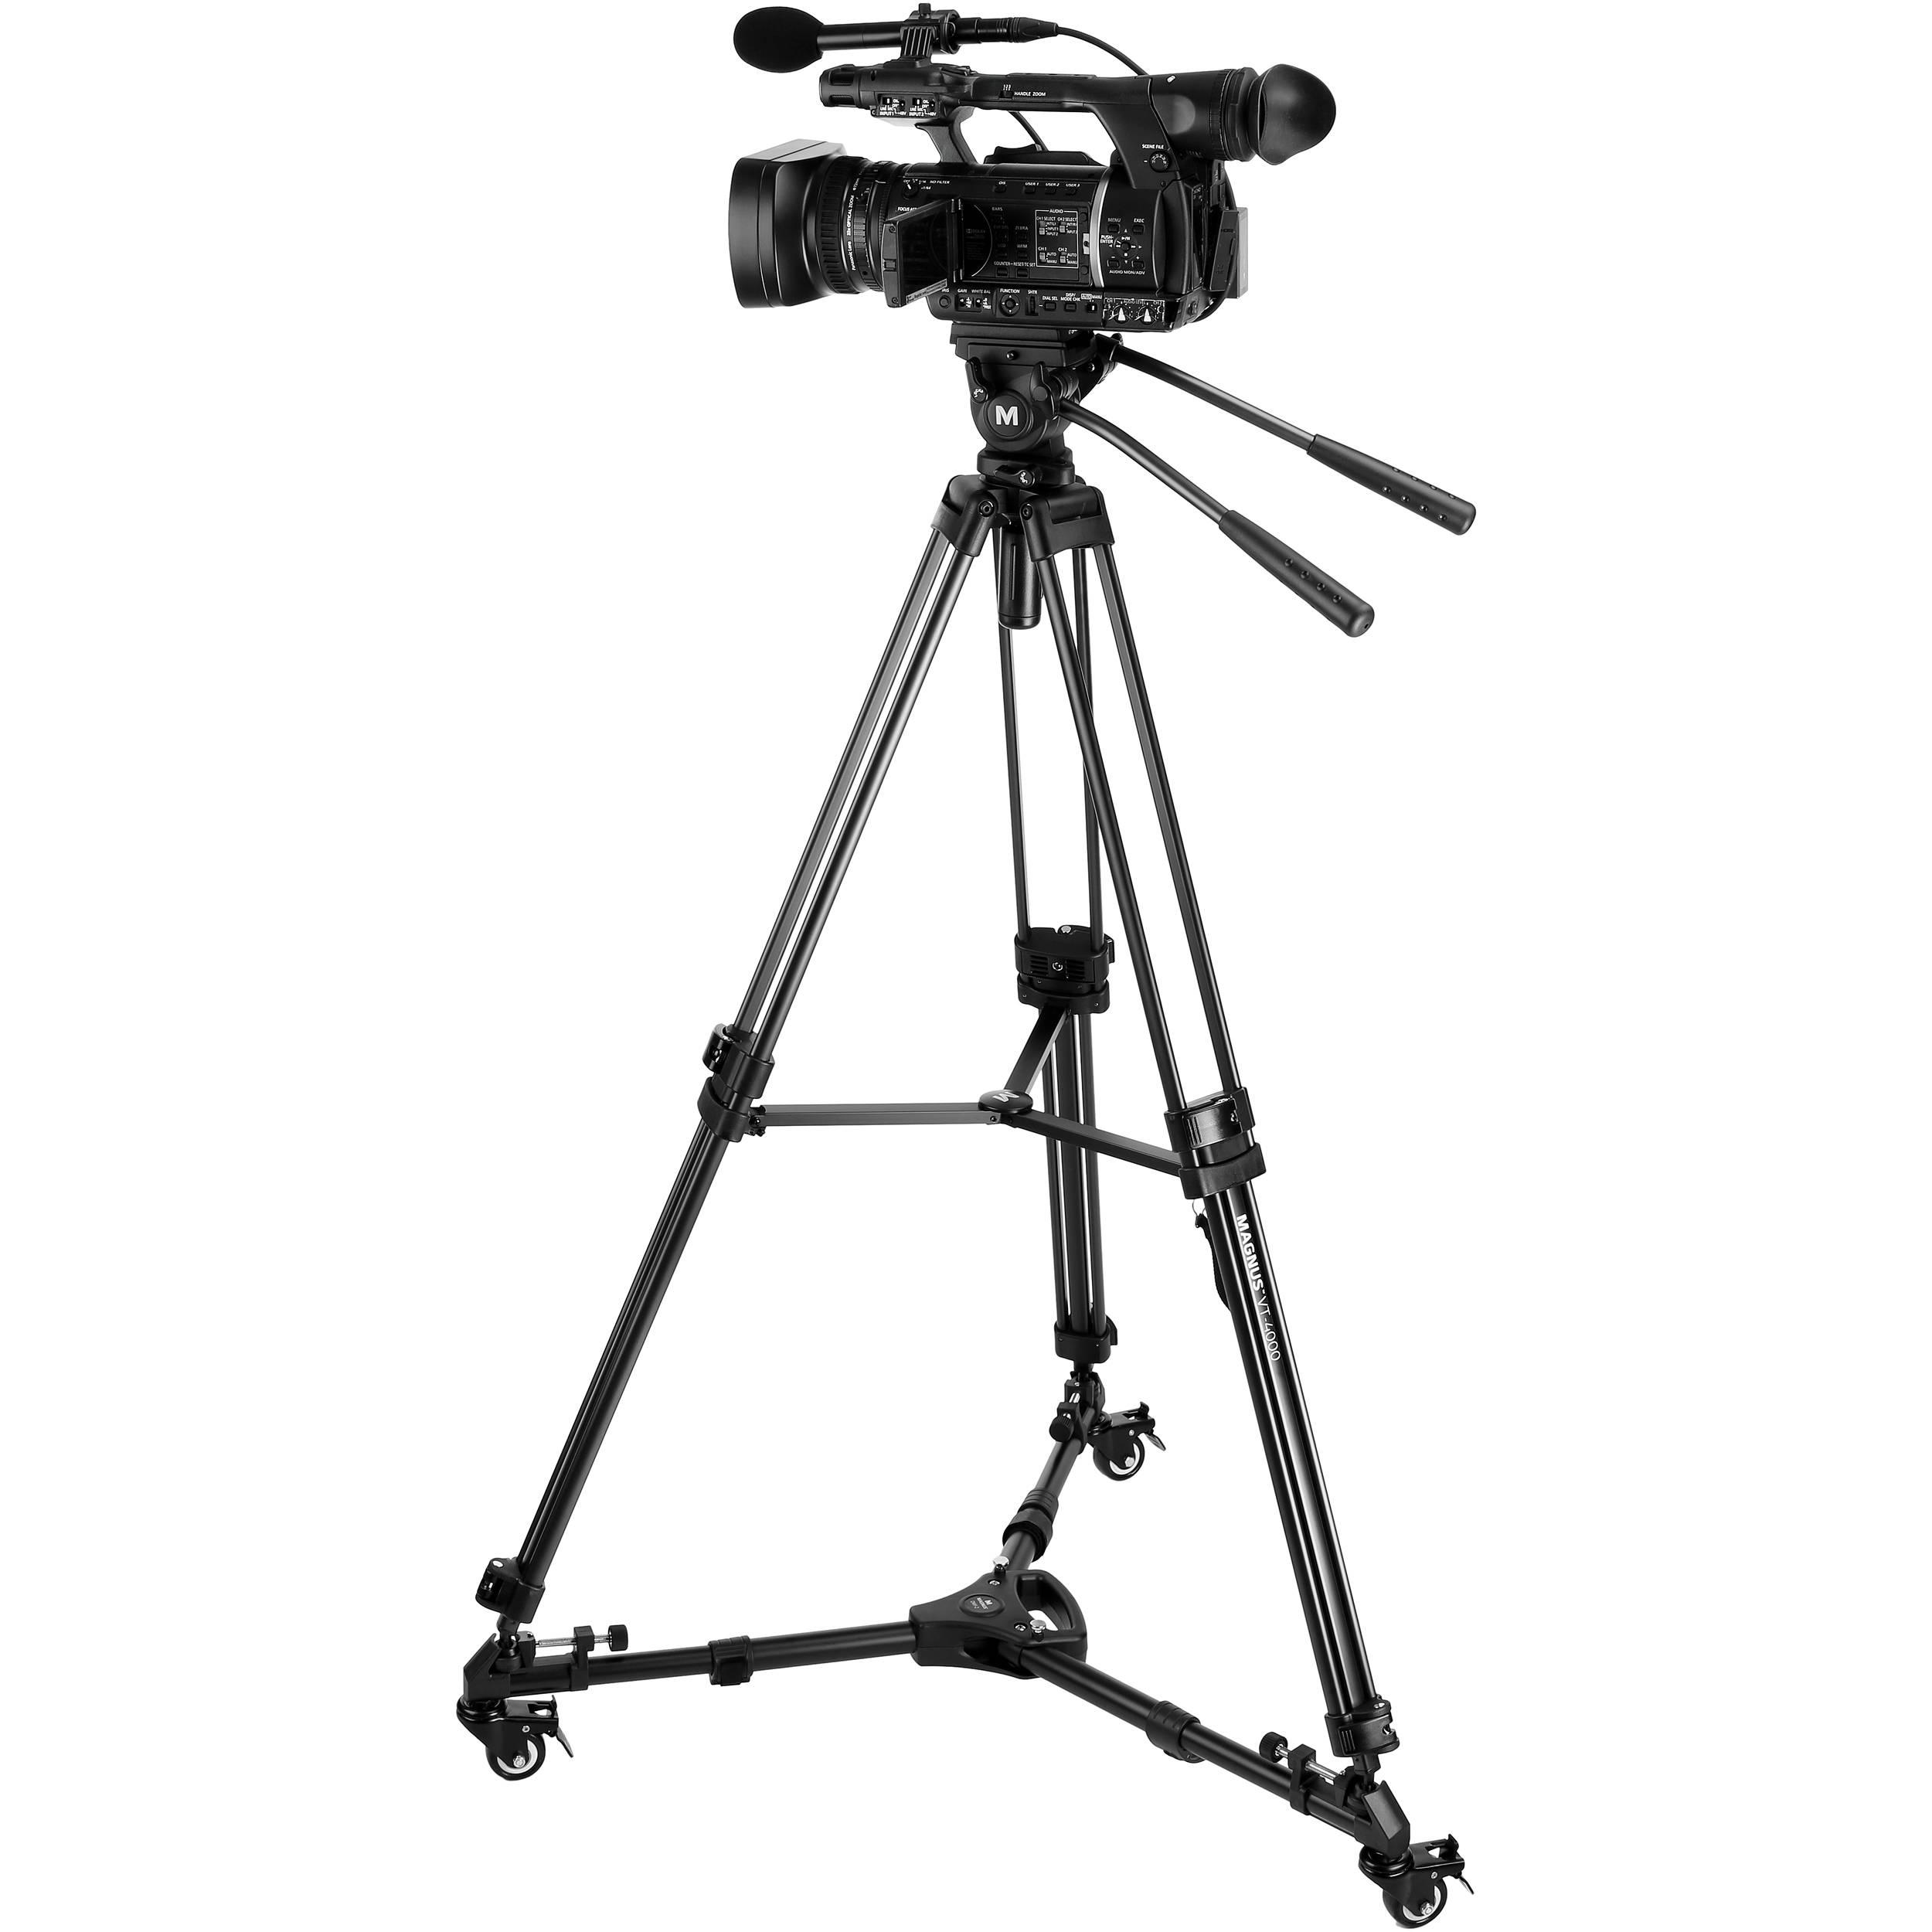 Magnus VT-4000 Tripod System Kit with Fluid Video VT-4000-K3 B&H